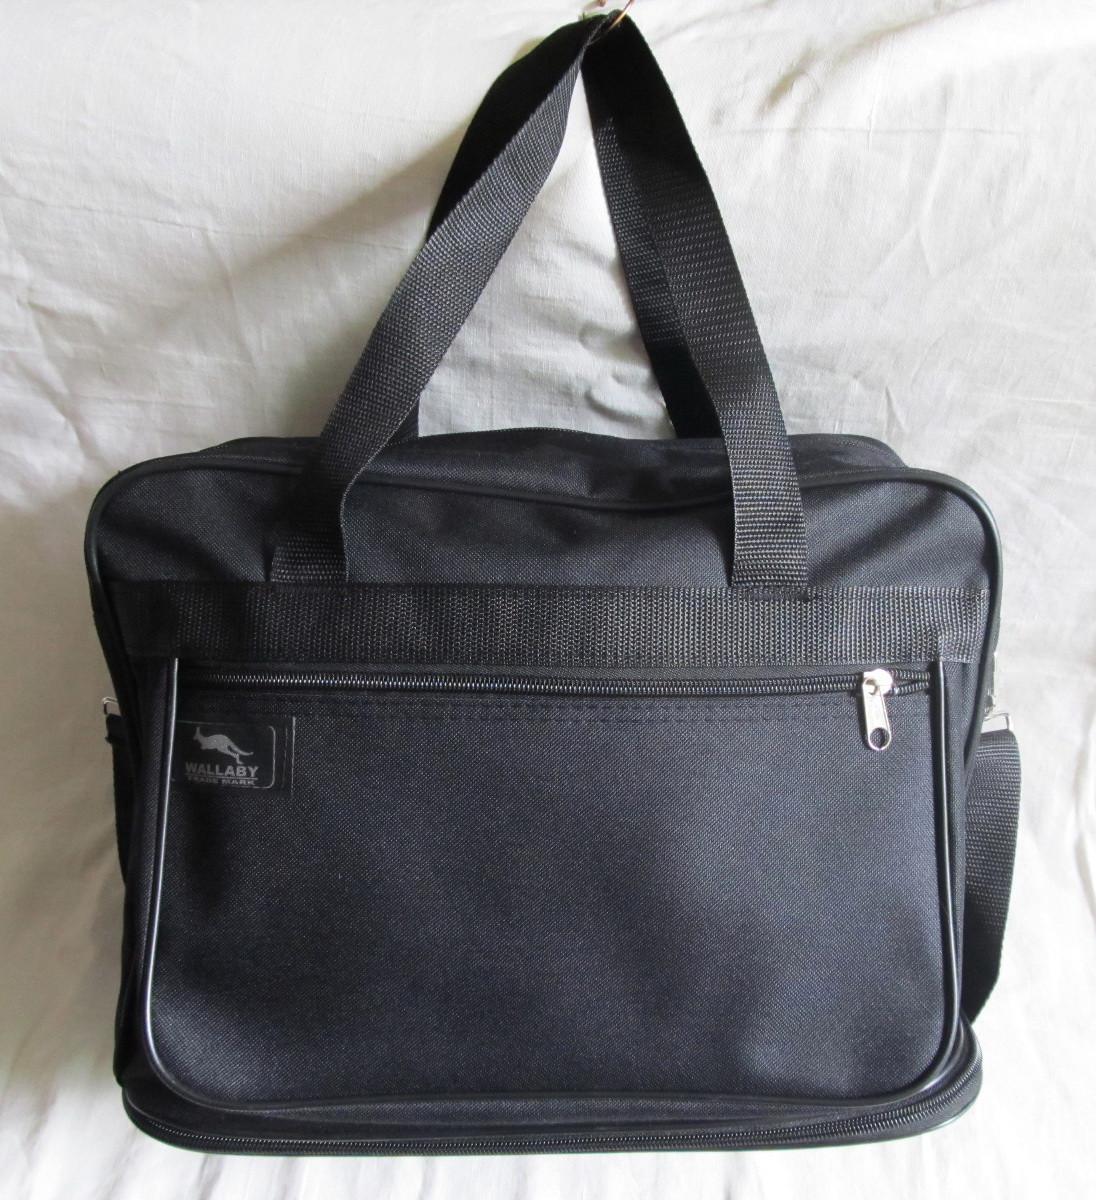 fa6ceff819b2 Мужская сумка Wallaby 2071 черная барсетка через плечо А4 с расширением  32х26+12х19см - Интернет